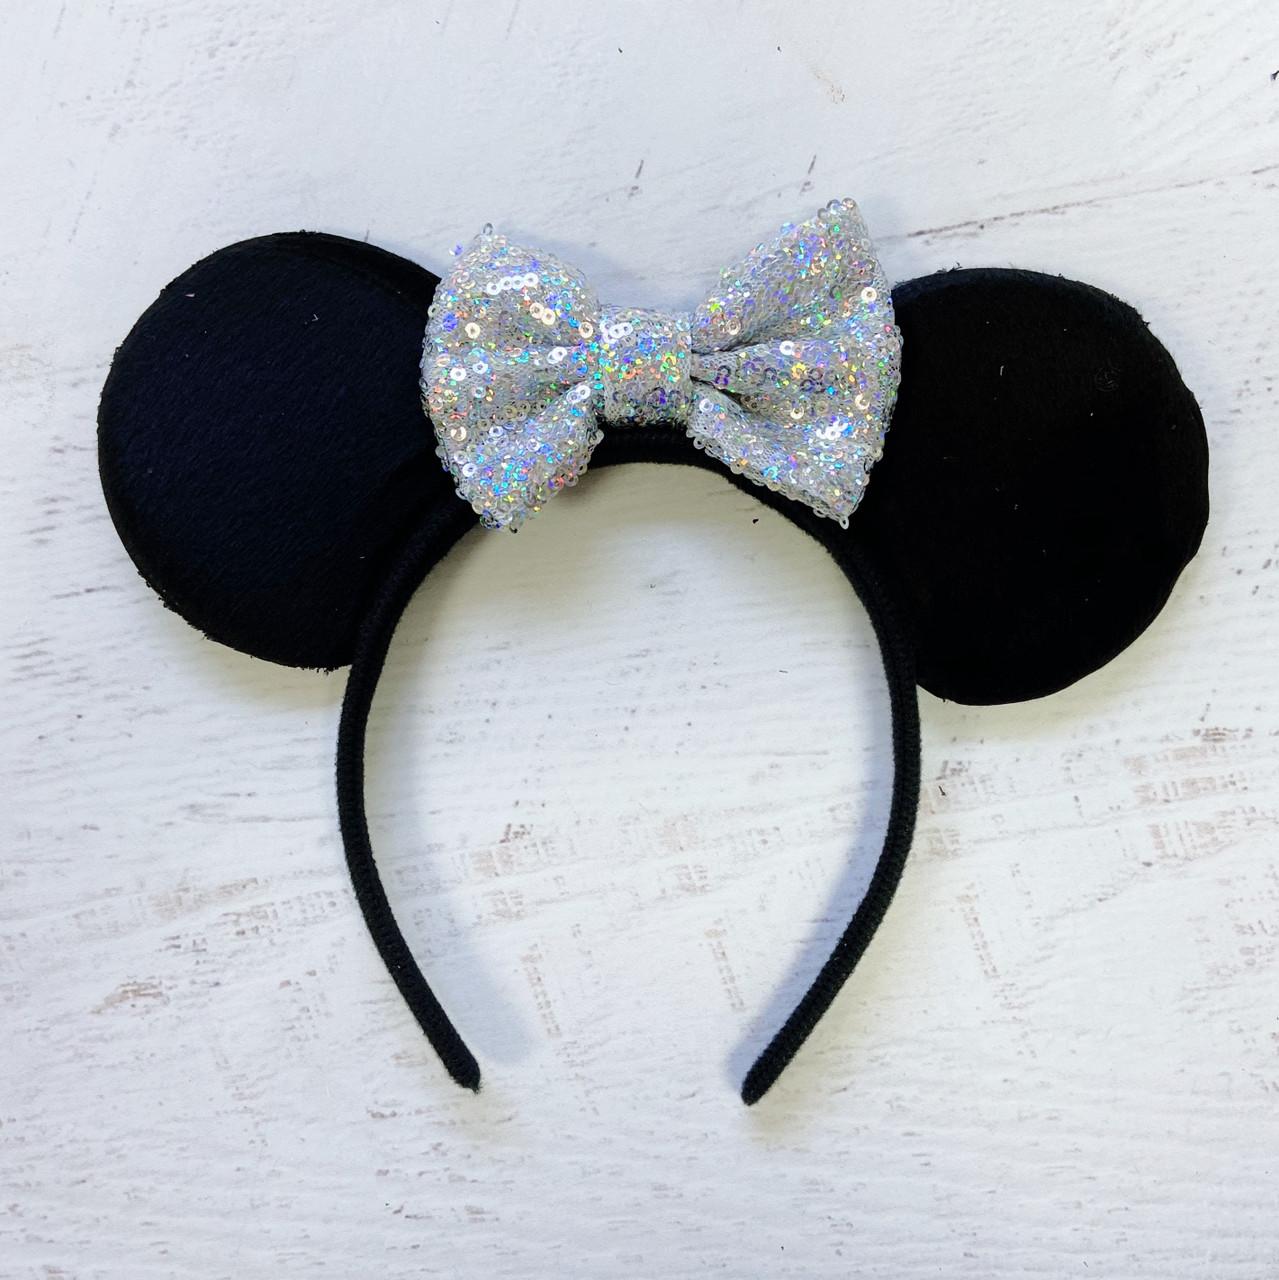 Minnie Mouse Sparkling Black Ears Headband Hot Pink Bow women girl fashion Shiny